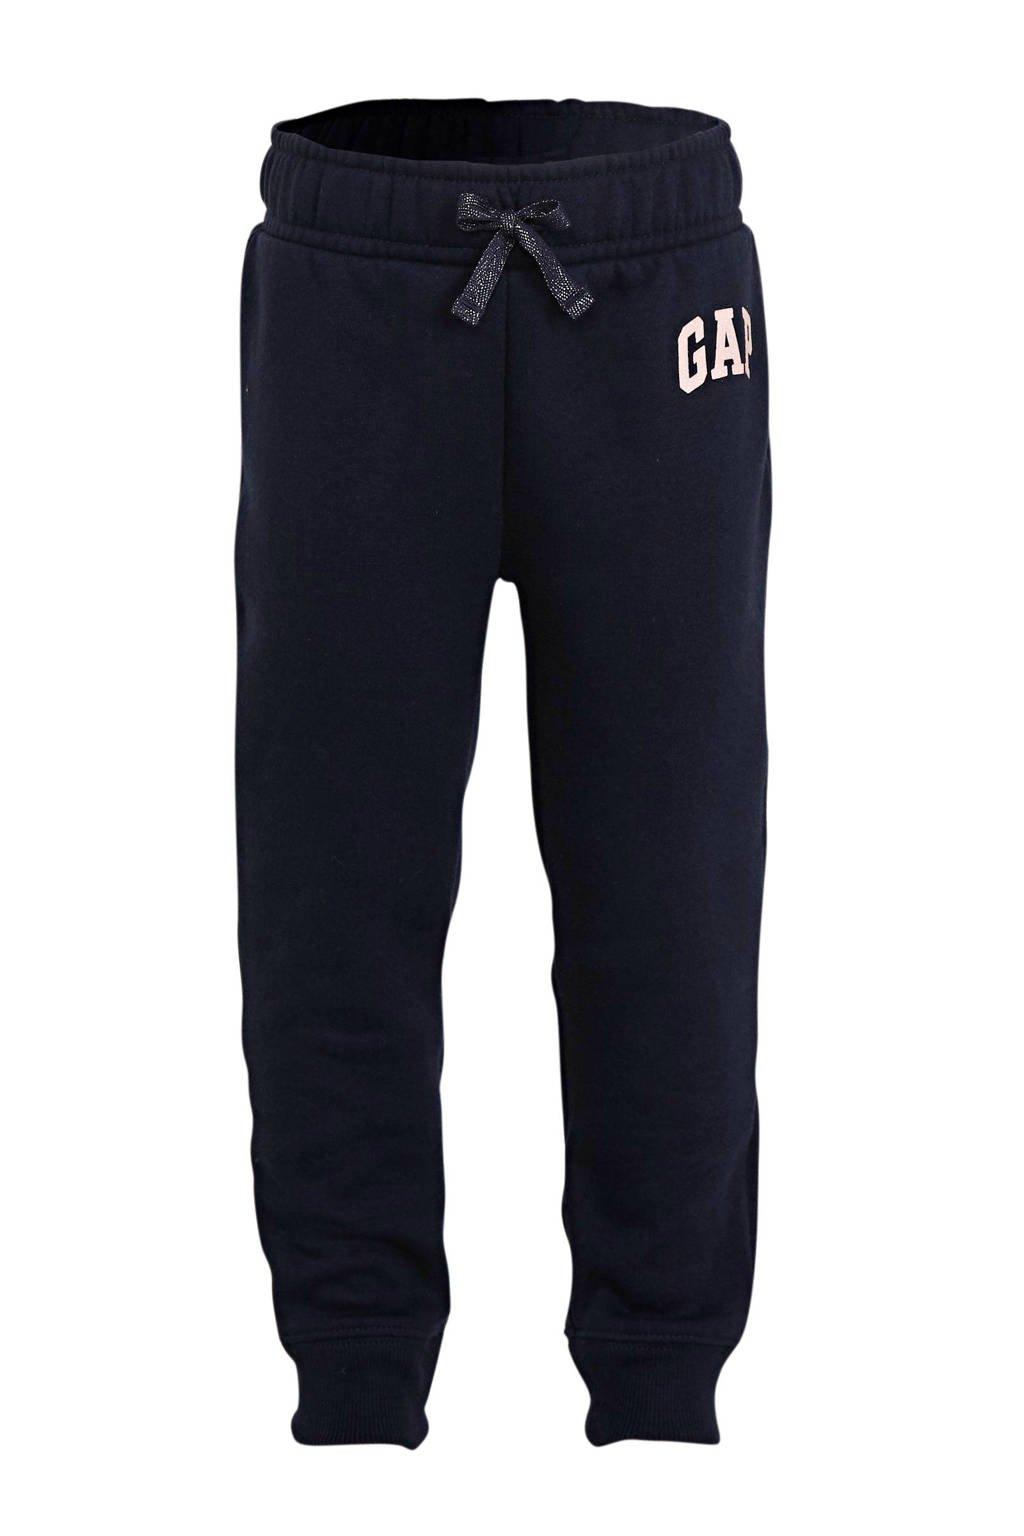 GAP baby broek met logo donkerblauw, Donkerblauw